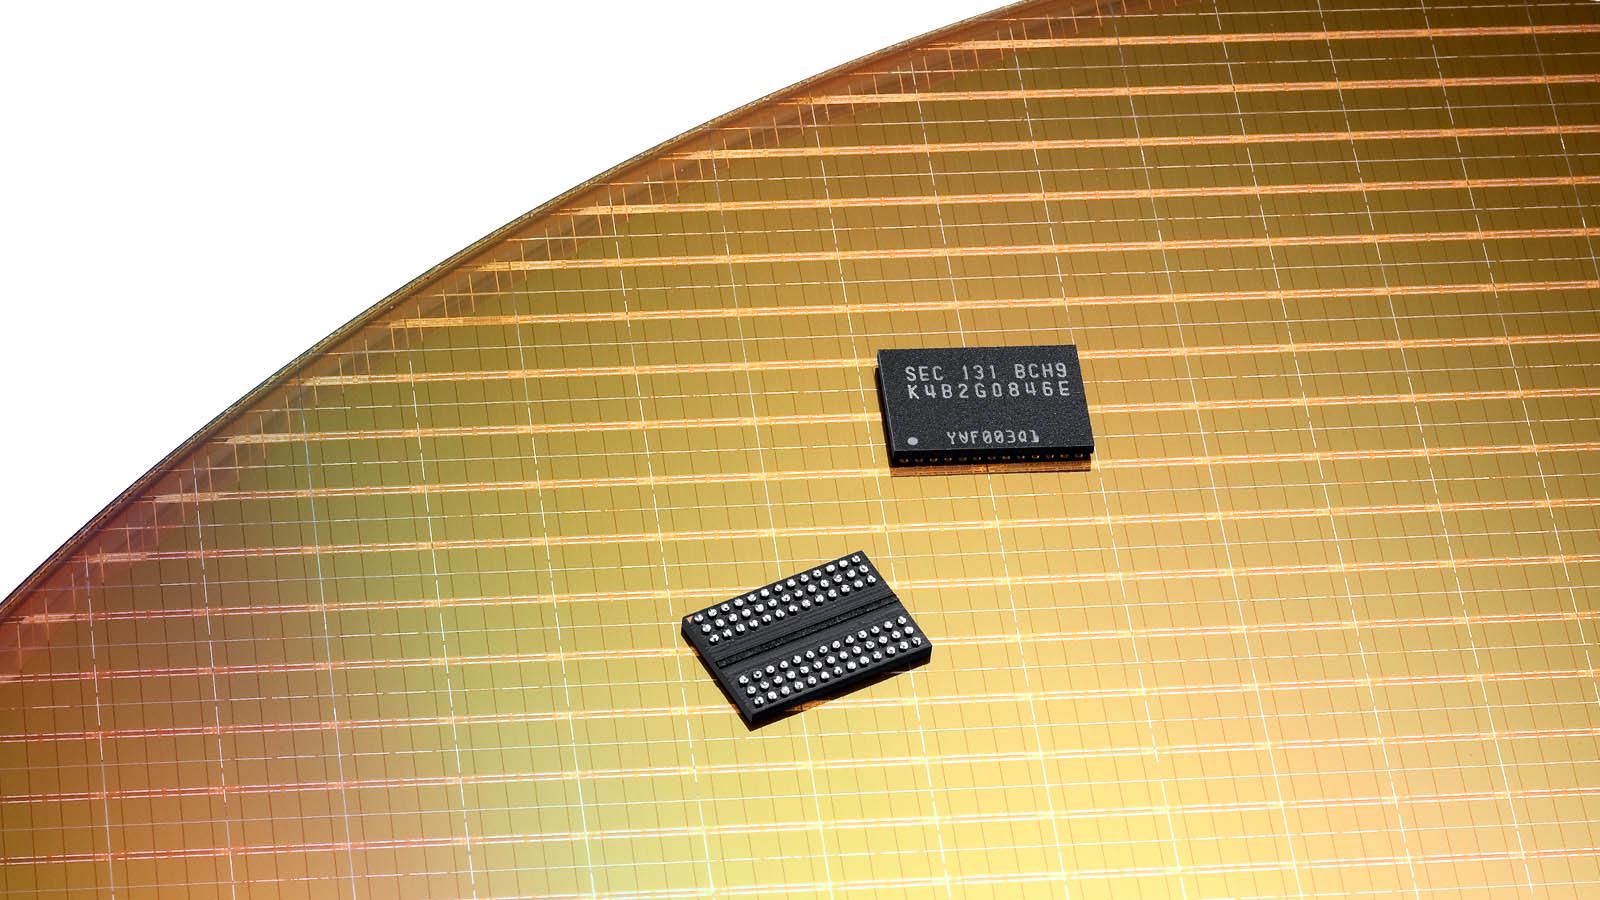 Samsung confirma el desarrollo de chips de 8 Gb de LPDDR5 a 10 nm 35